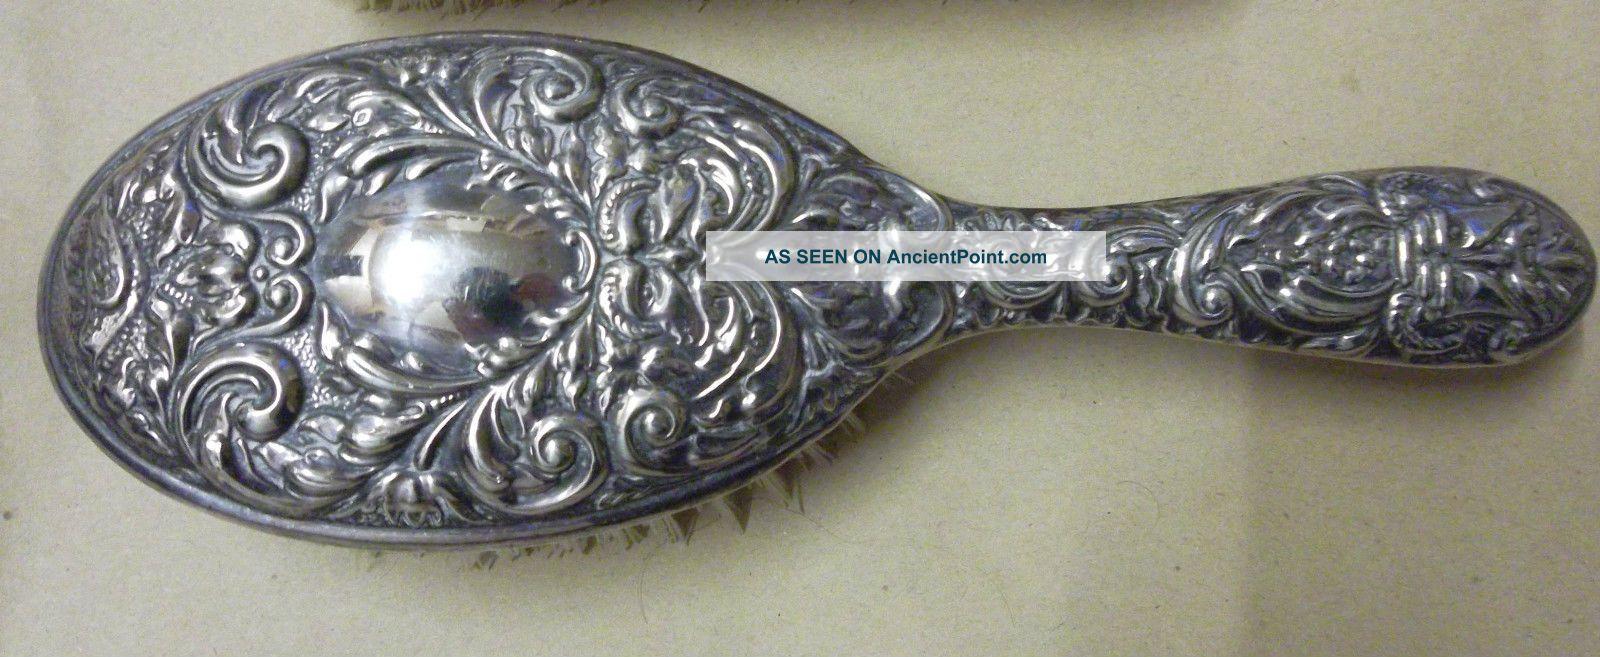 Broadway & Co - Solid Silver Hair Brush - Birmingham 1973 Bi - Centenary Hallmark Brushes & Grooming Sets photo